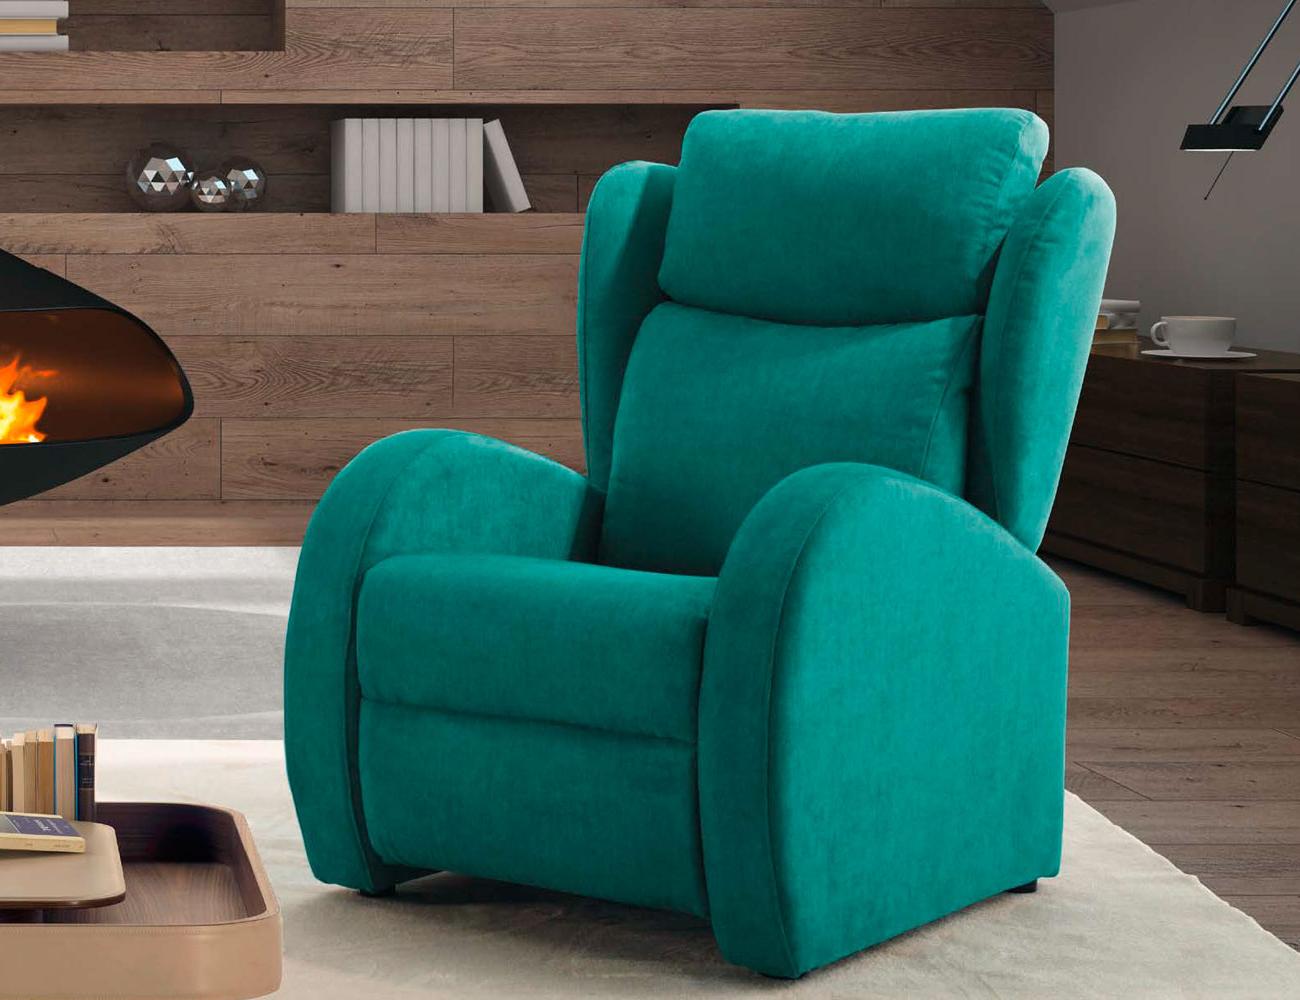 Sillones Relax Modernos Q0d4 Sillon Relax orejero Con Diseà O Algo Moderno Y Con Buen Tejido